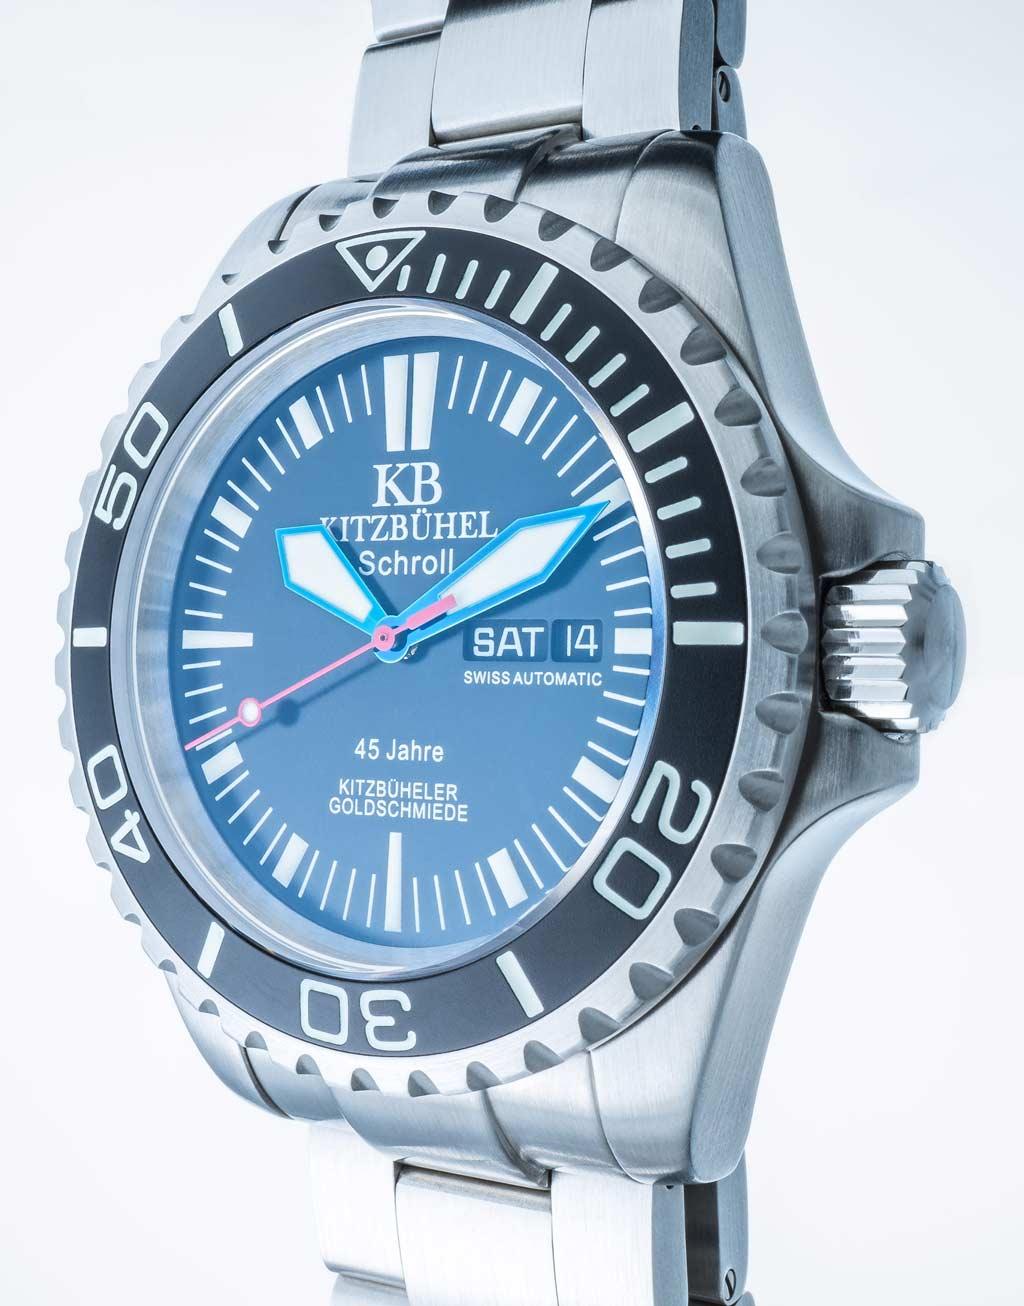 KB Uhr – Jubiläumsuhr